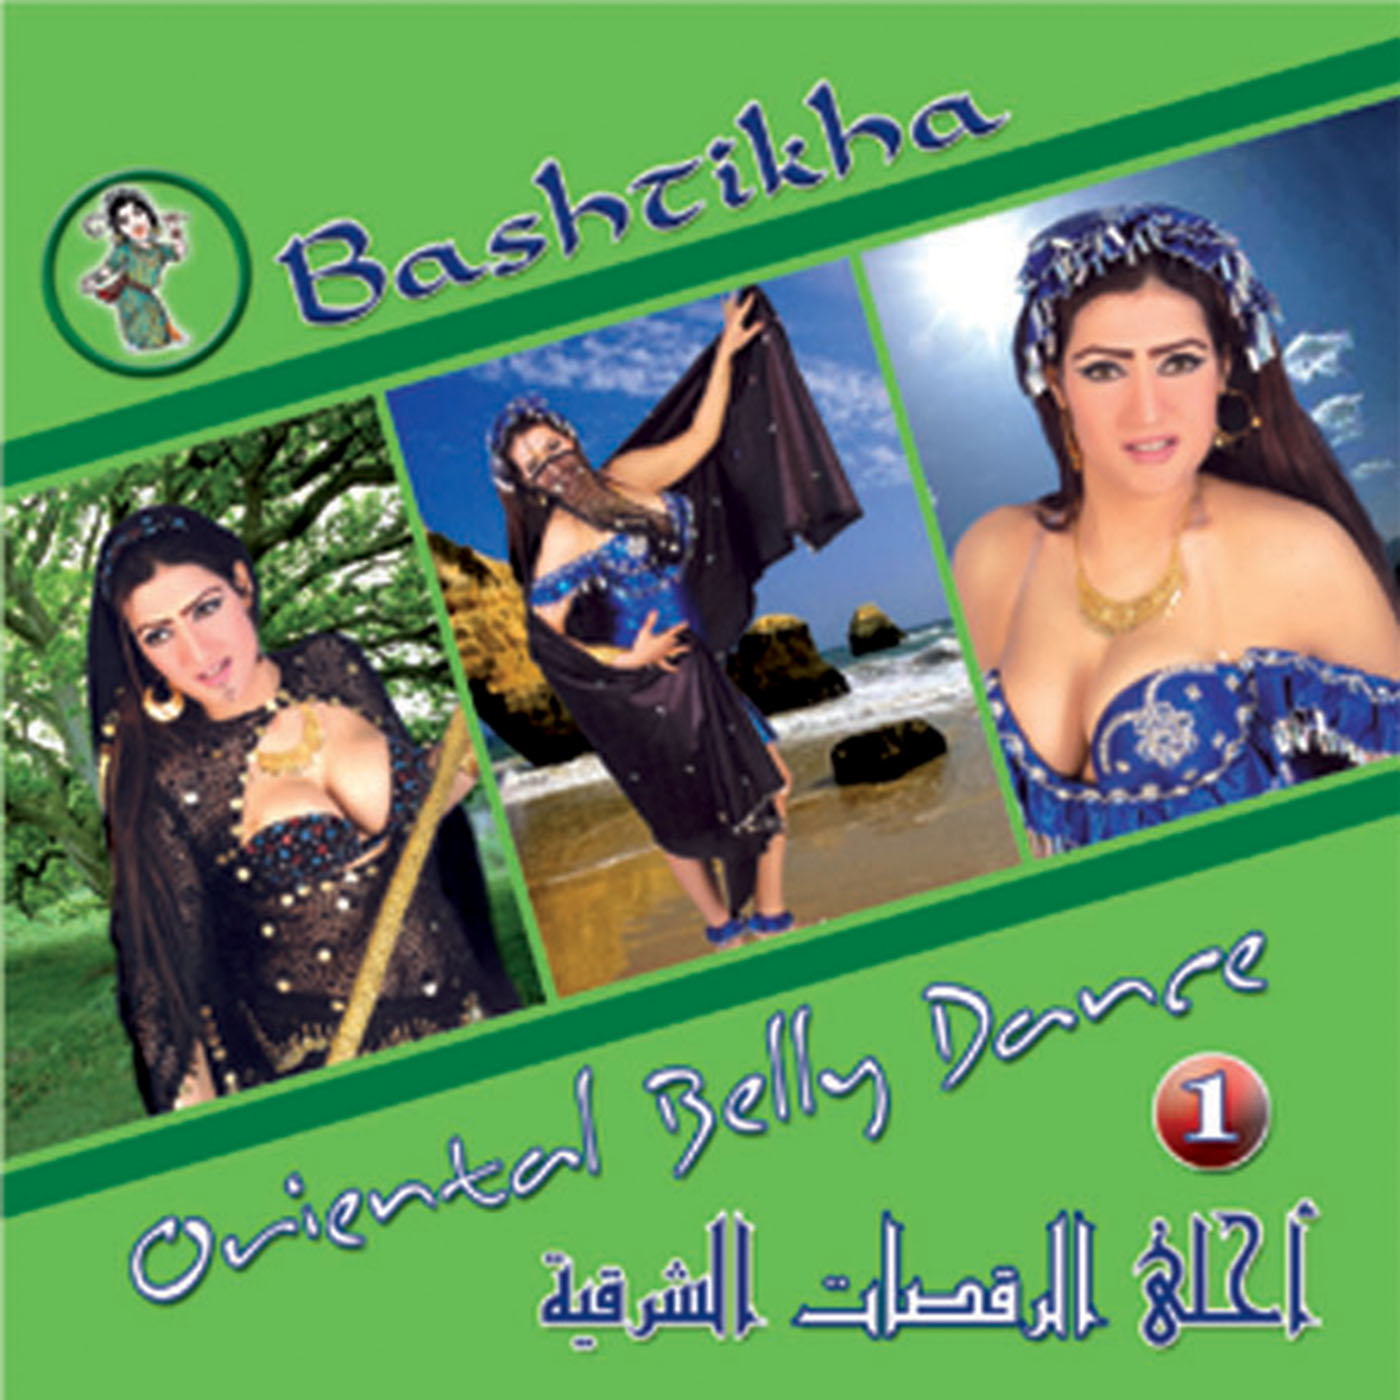 BASHTIKHA (Oriental Belly Dance 1 )/  VARIOUS ARTISTS    BUY It